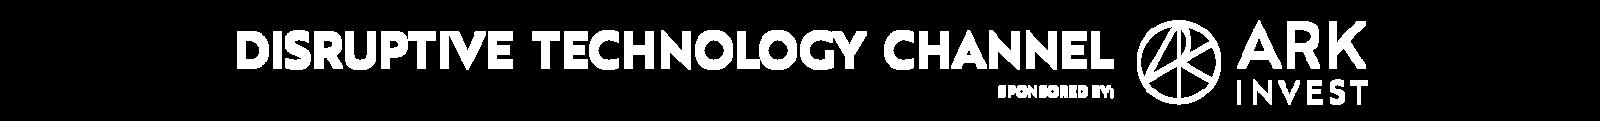 Disruptive Technology Channel - ETF Trends